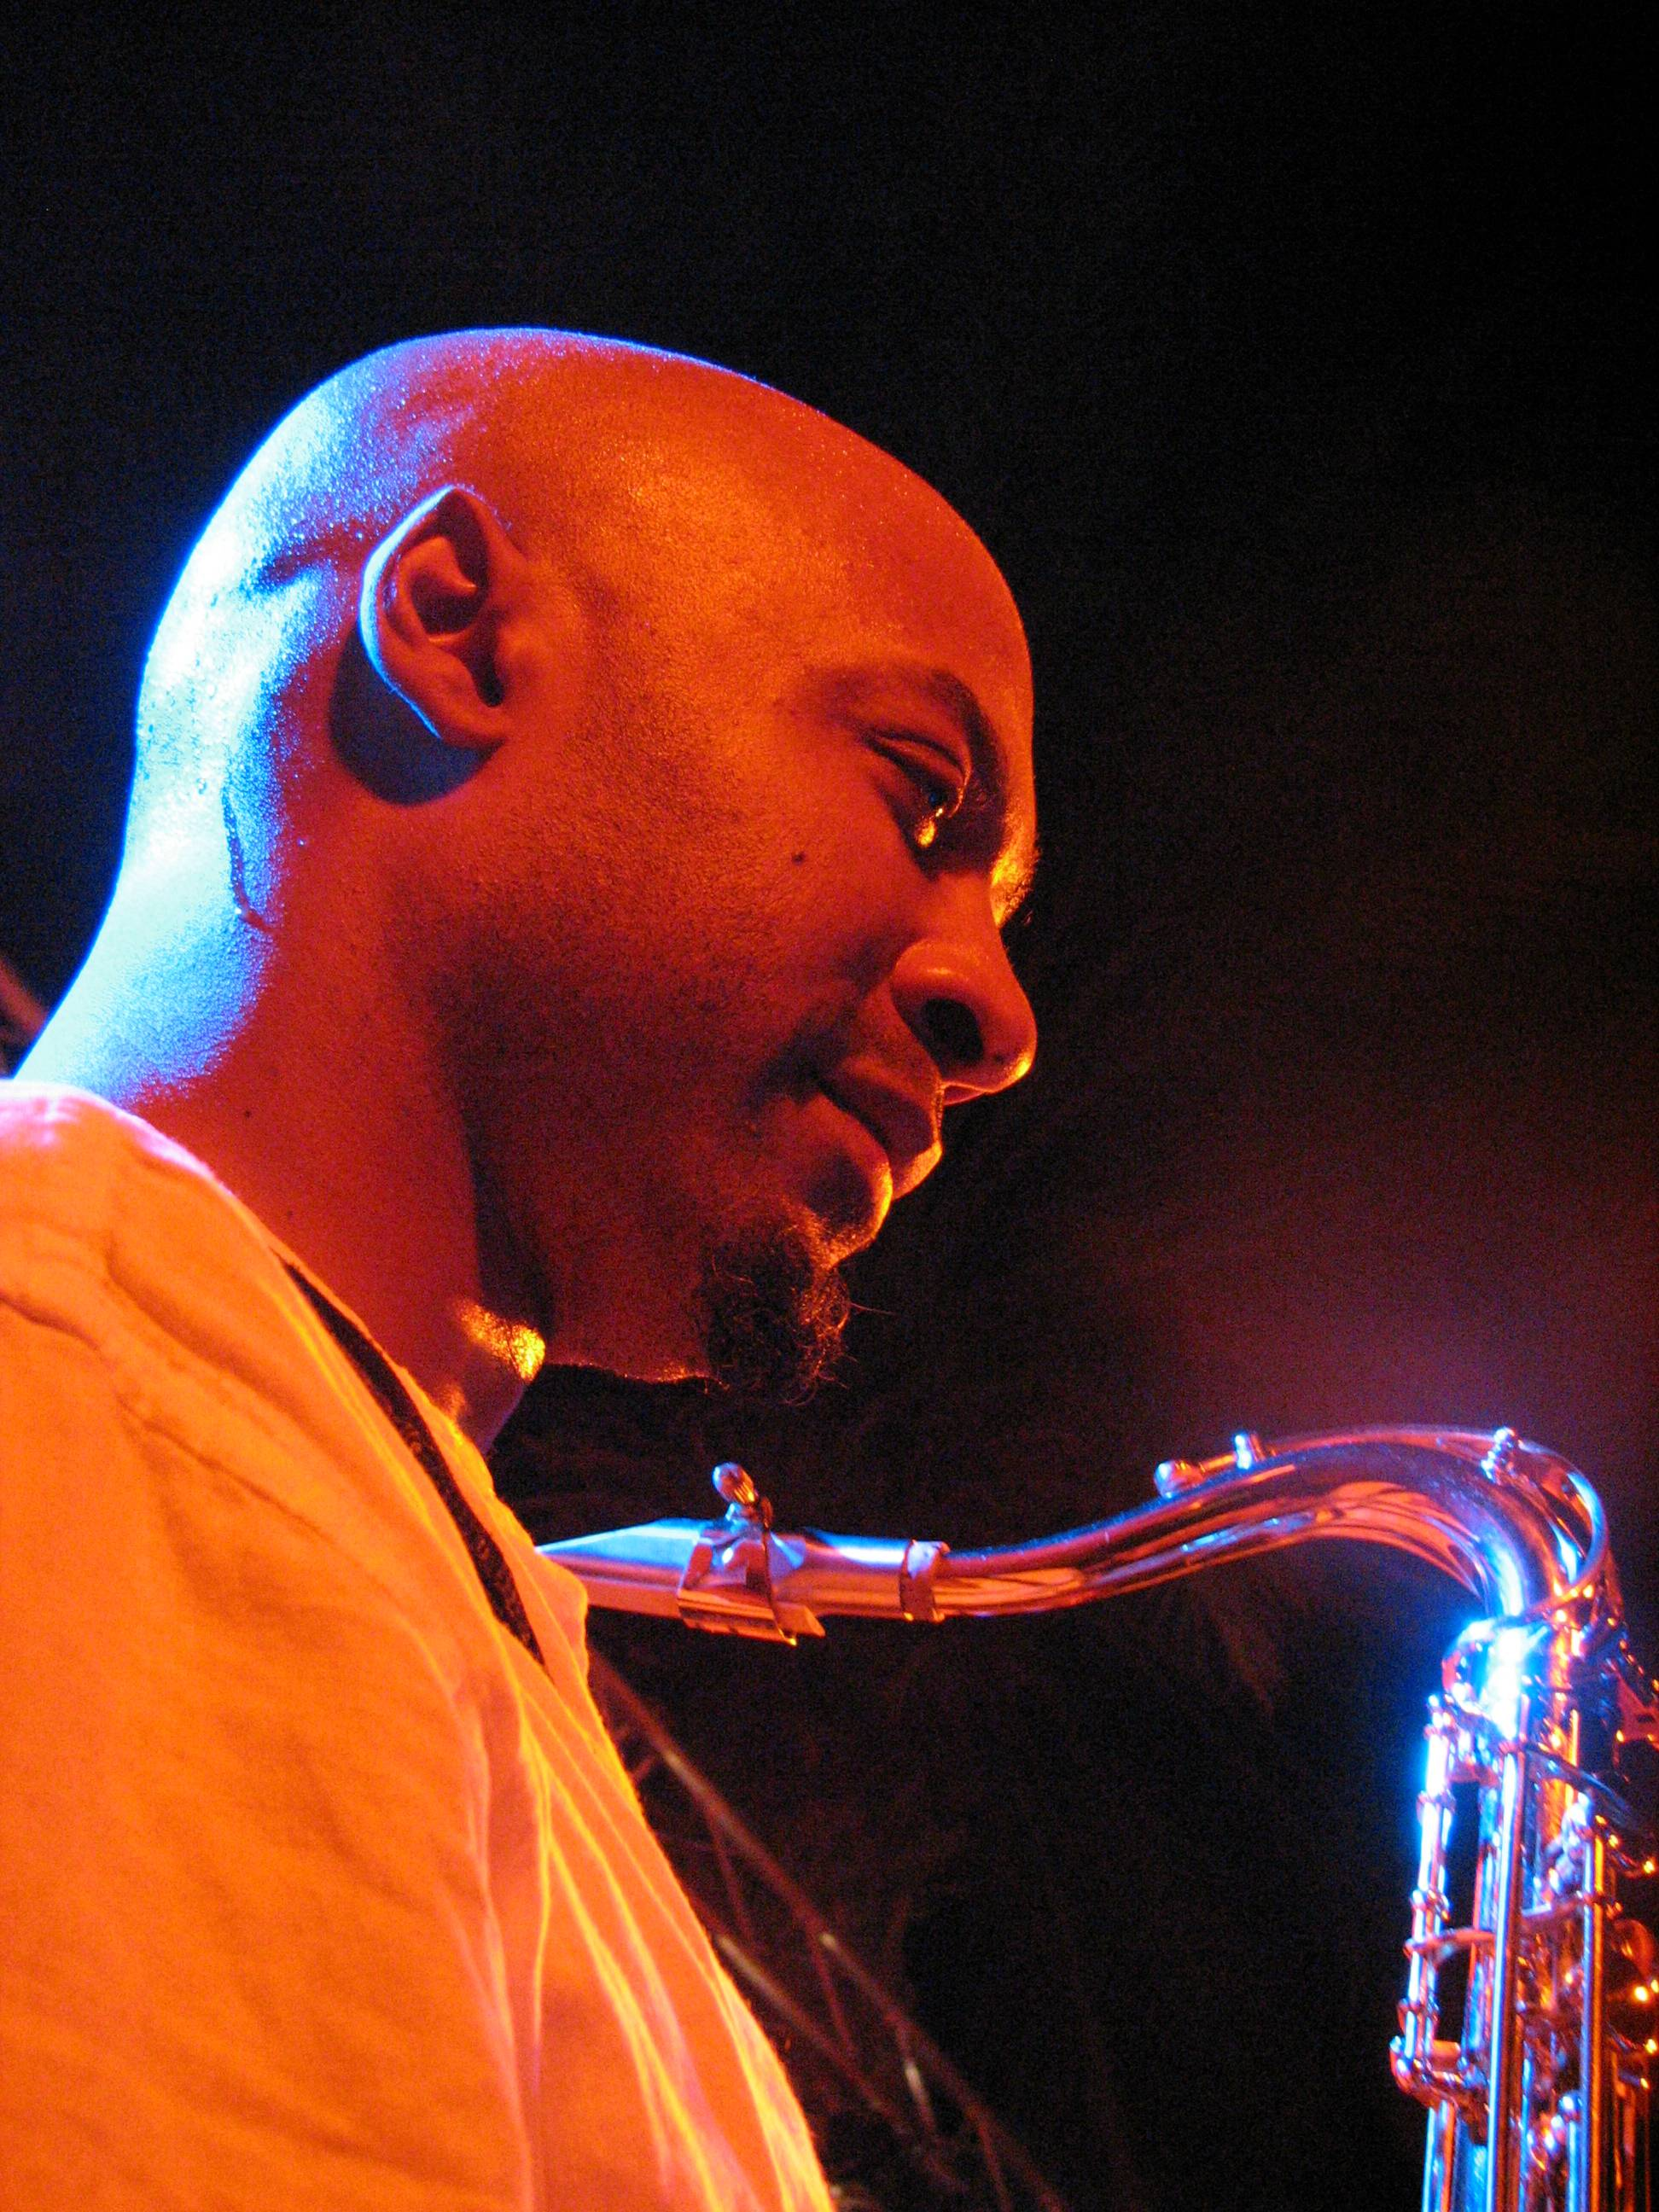 2007-08-30 Ron Blake , Red Sea Jazz Festival, Eilat, Israel